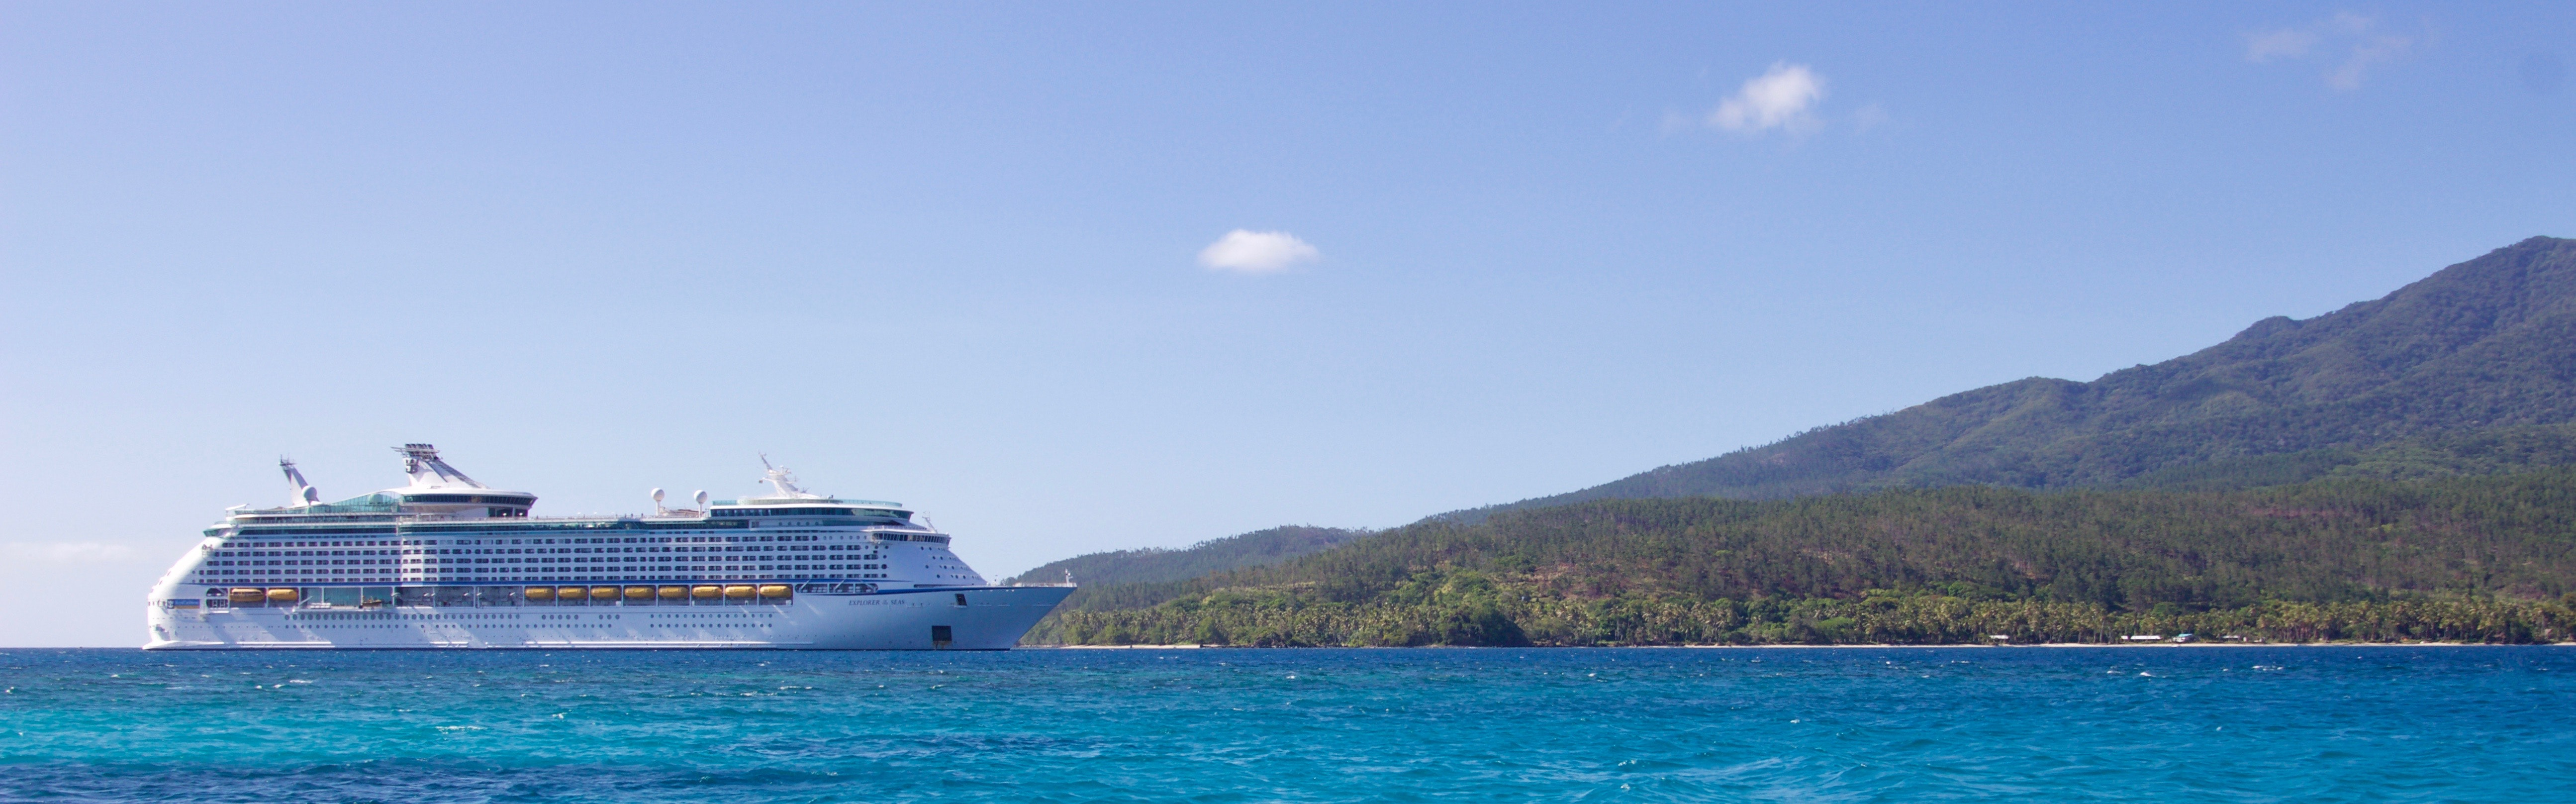 MSC Cruises Winter Escape to the Caribbean